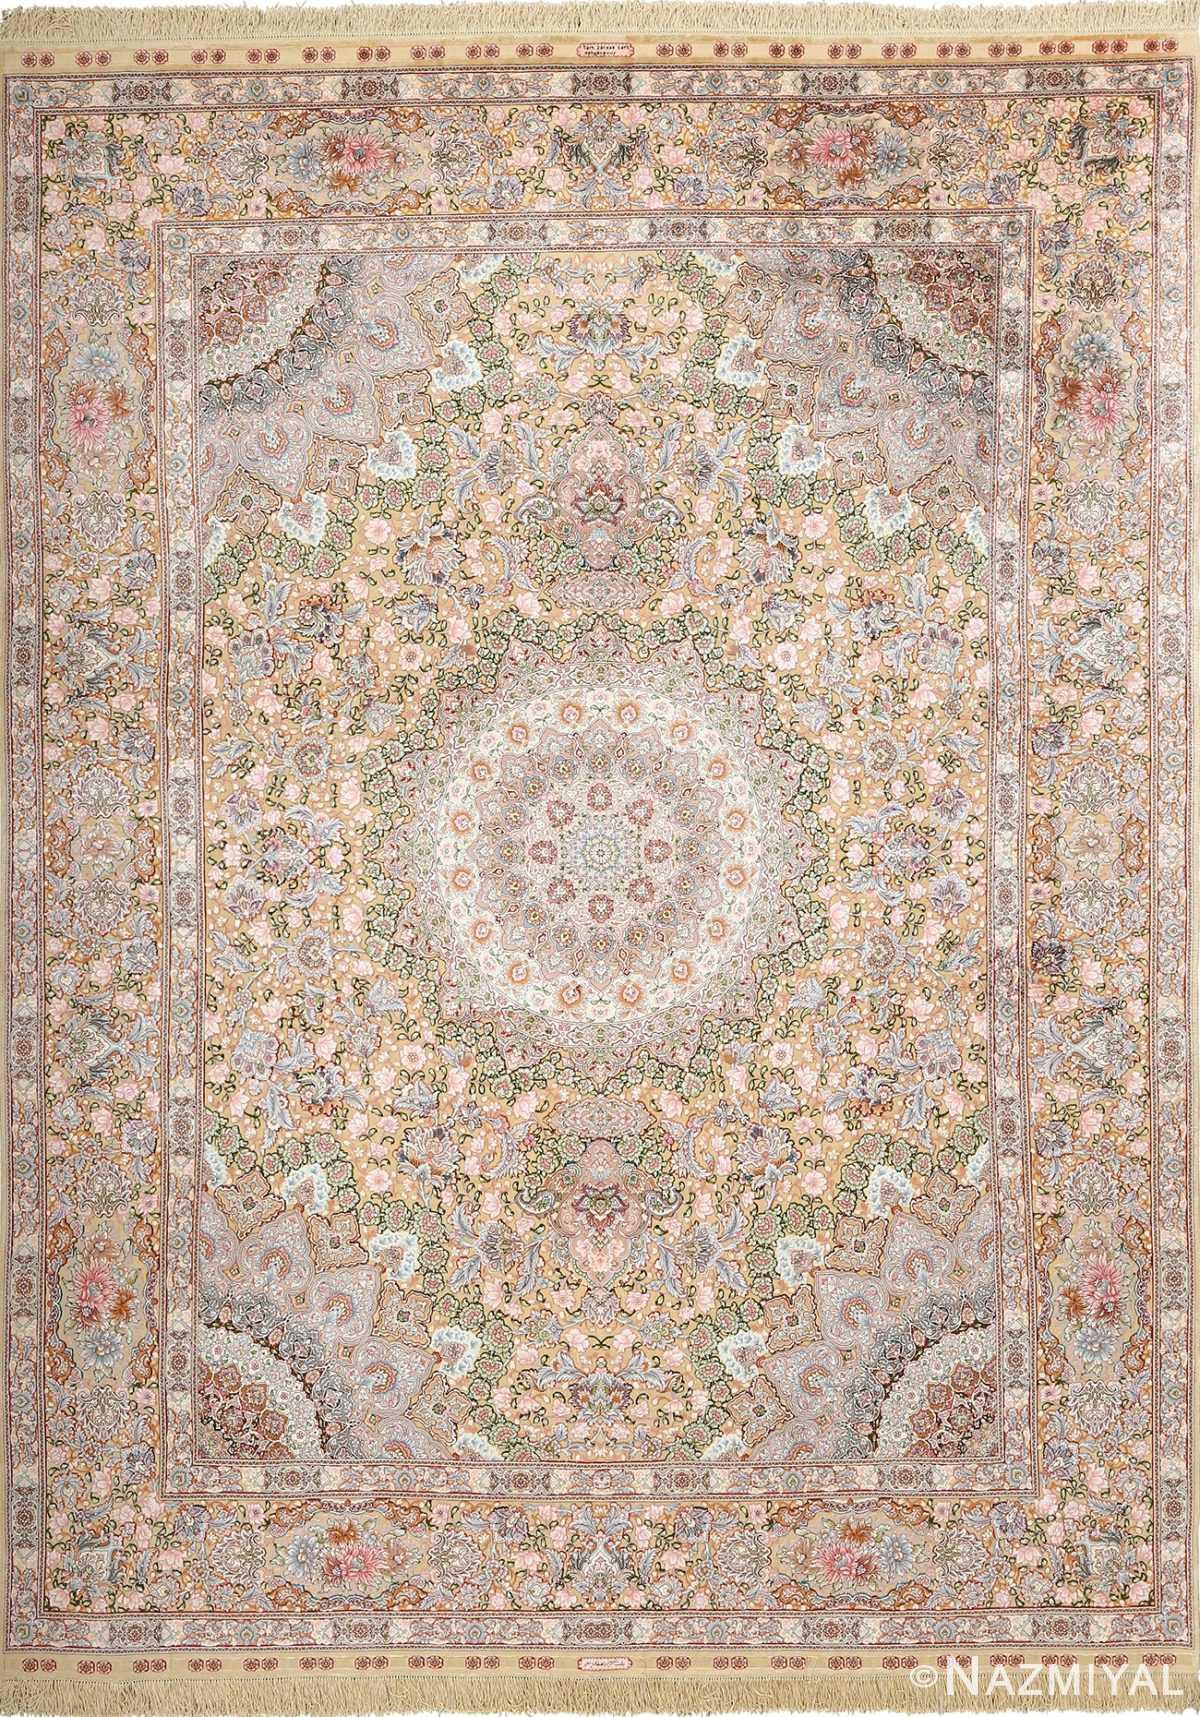 fine silk and gold thread vintage tabriz persian rug 51054 Nazmiyal